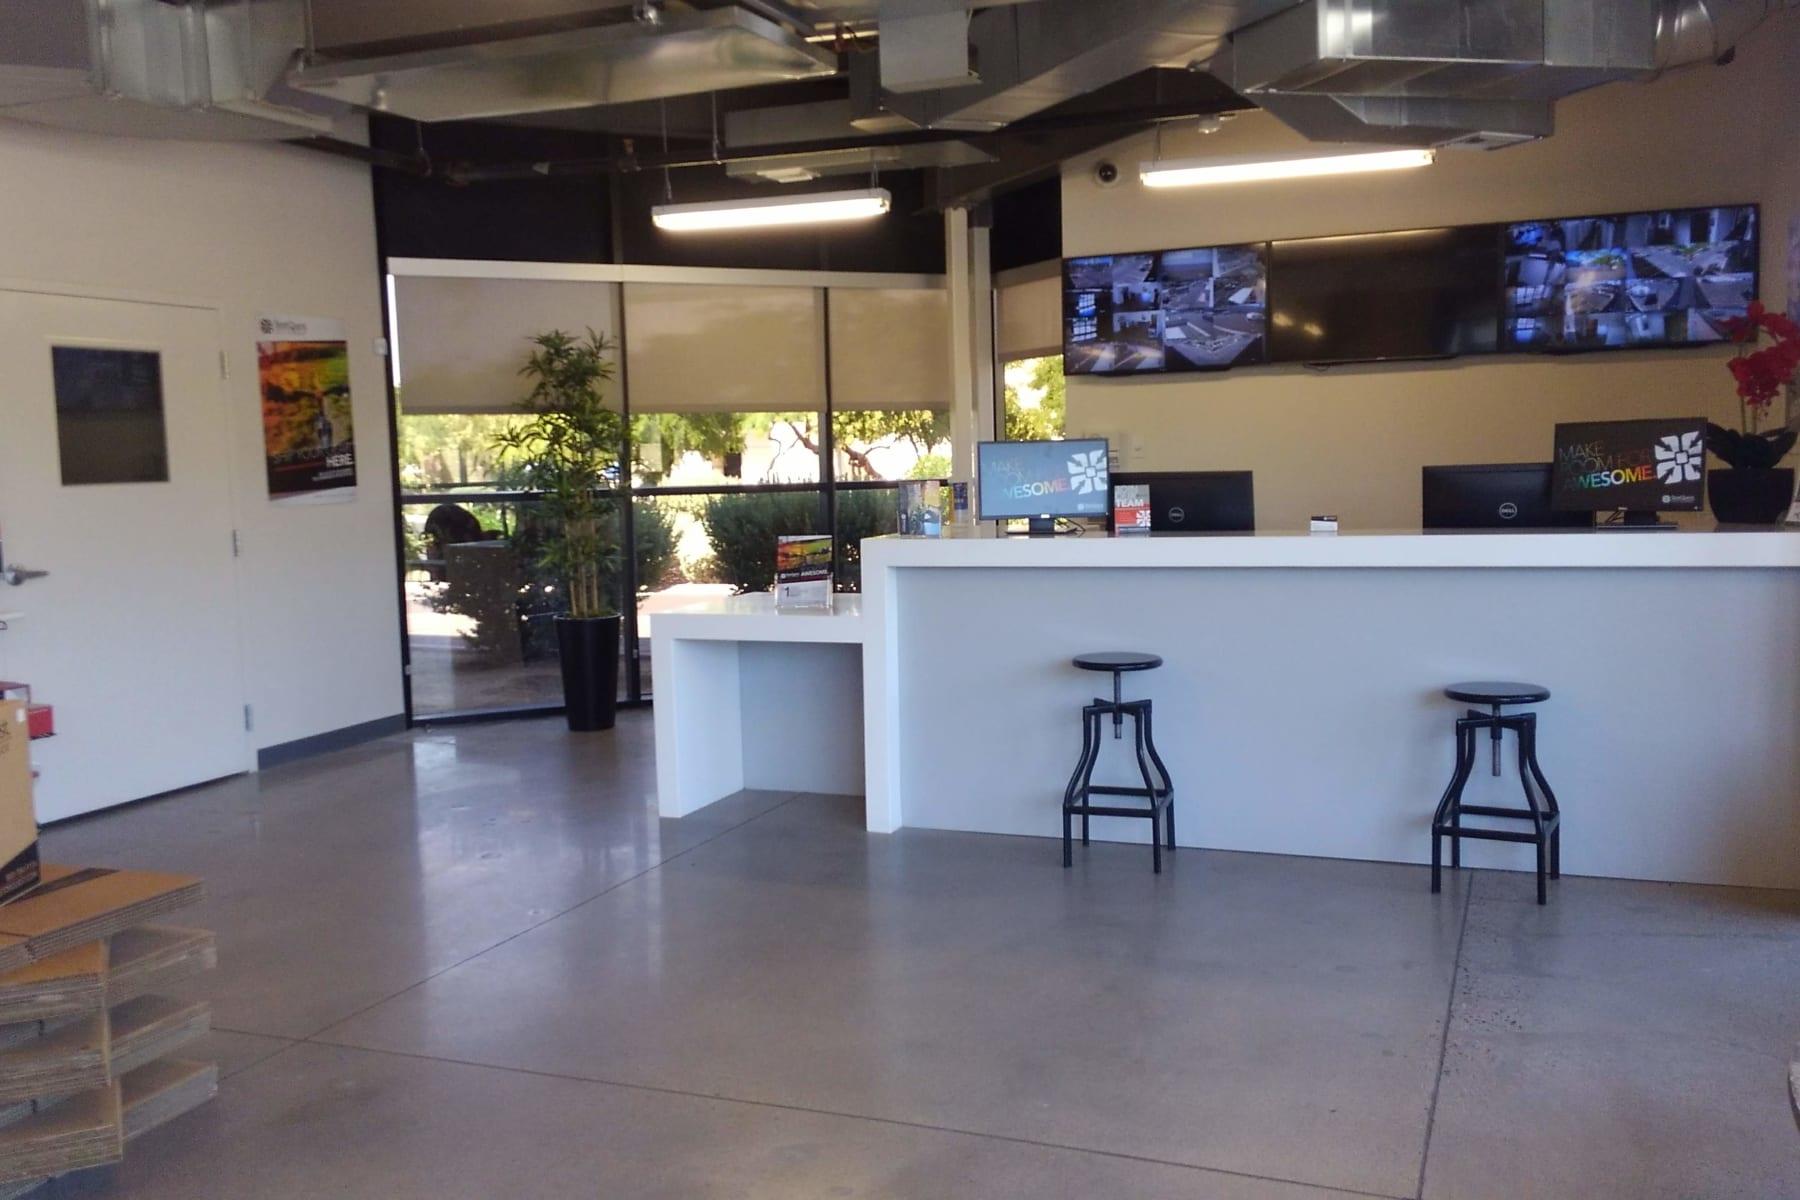 Leasing office at StorQuest Self Storage in Chandler, AZ